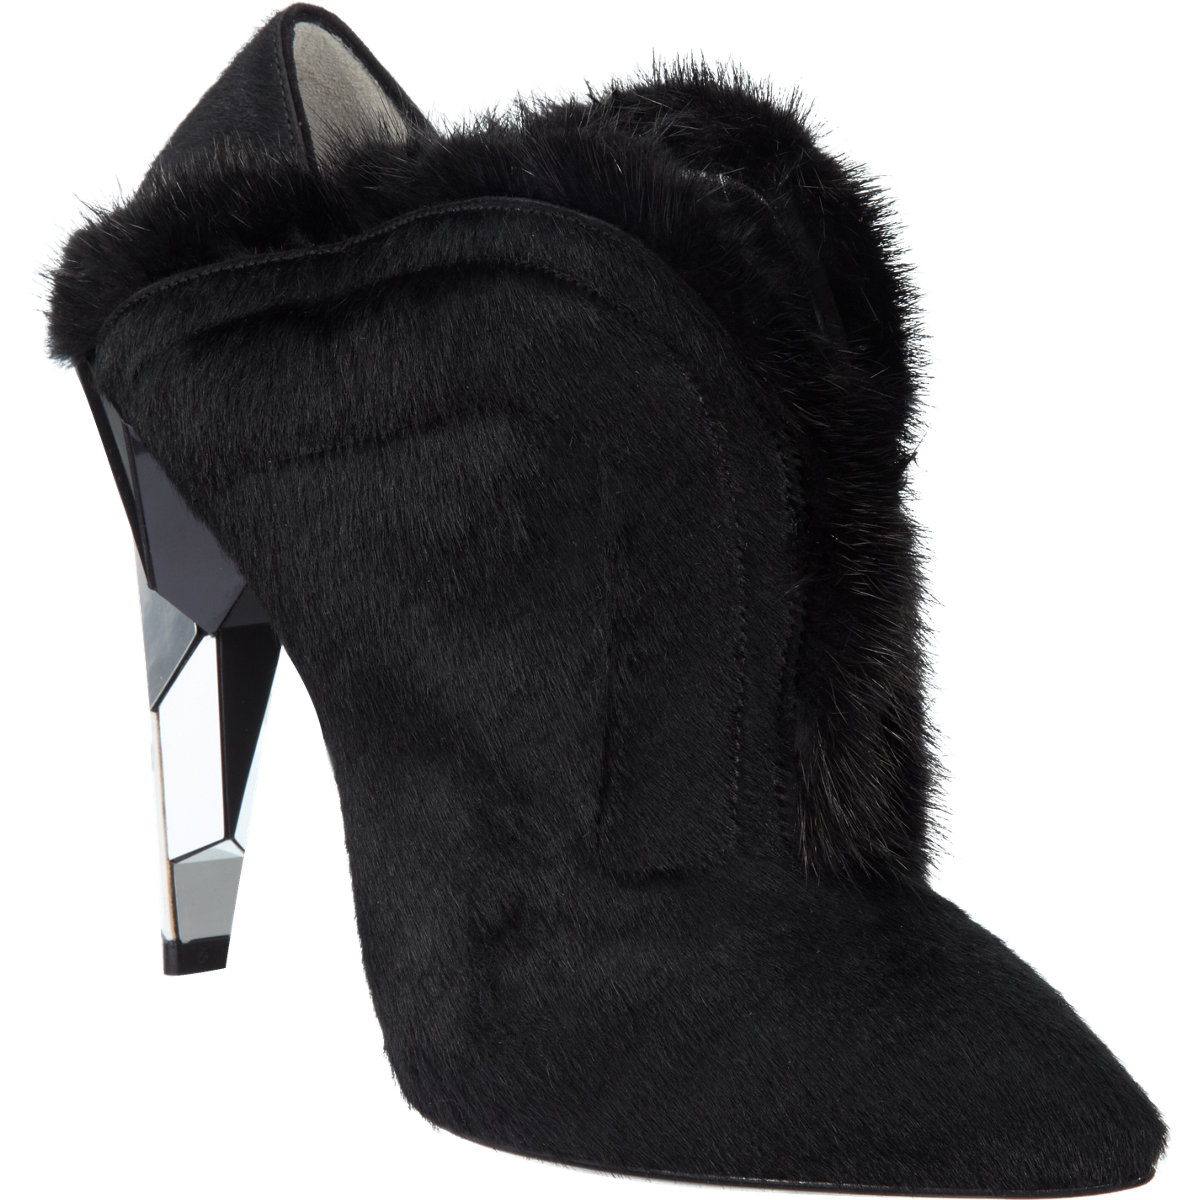 FENDI Fur-Trimmed Calf-Hair Shoe Boot $719 Sale